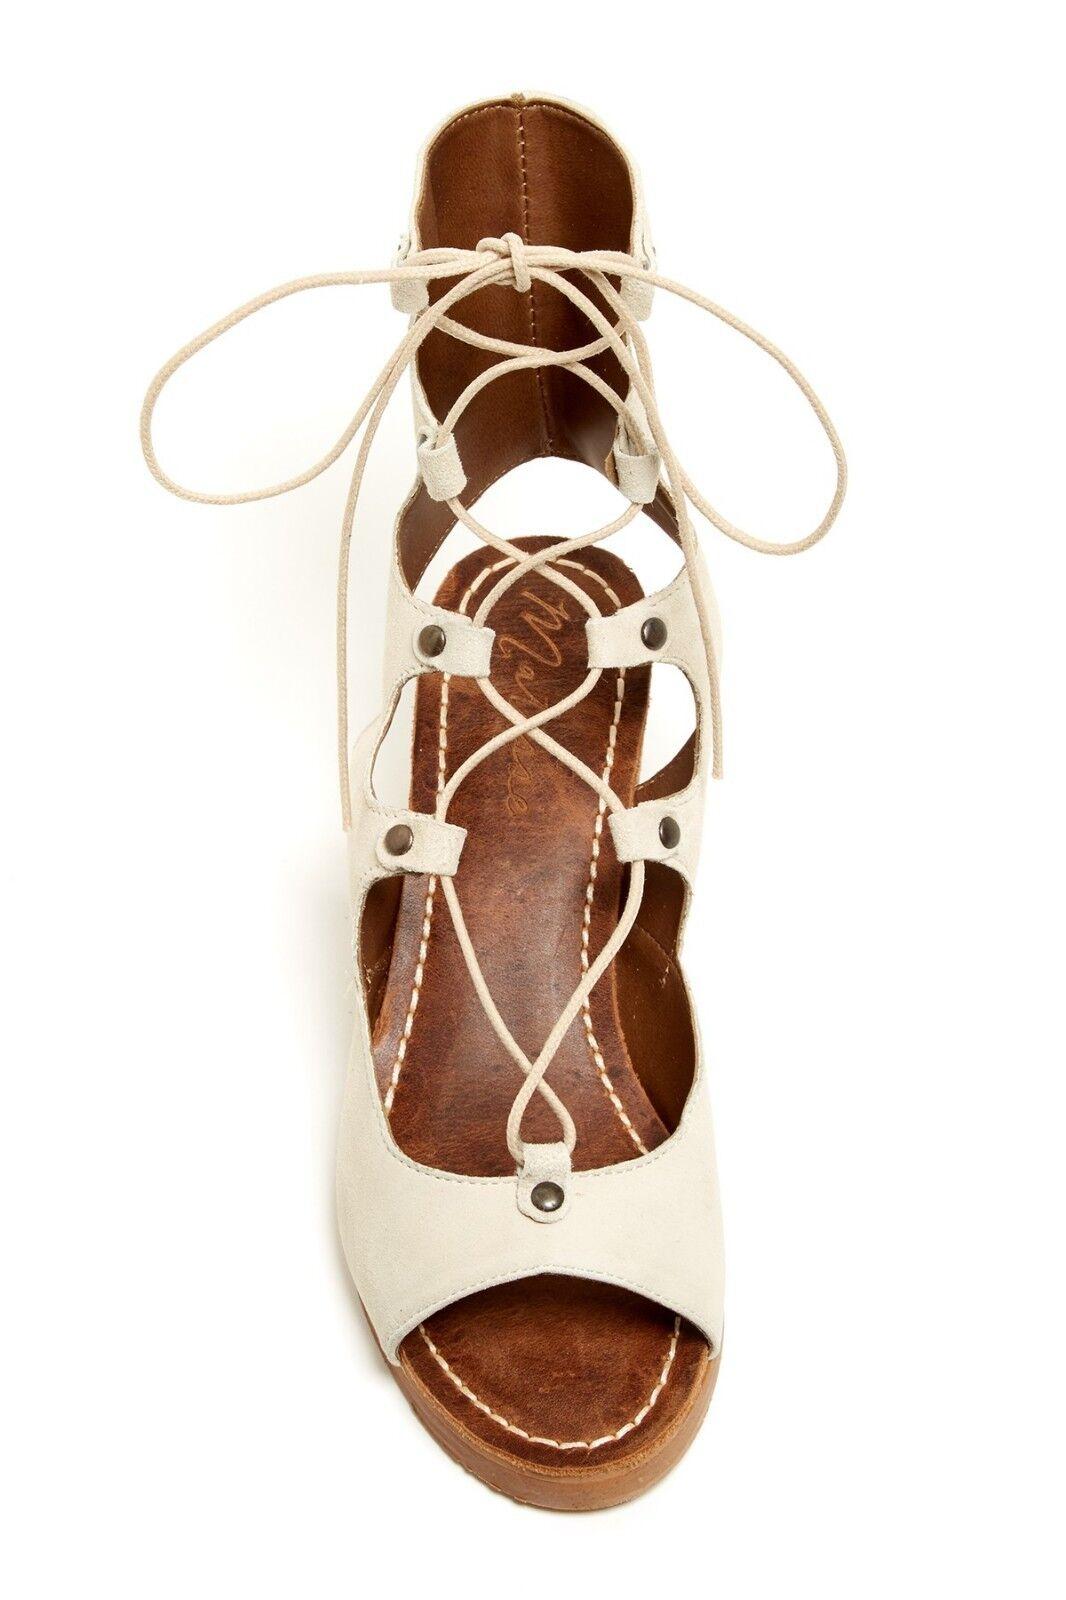 Matisse Expo Suede Lace Up Bootie Sandalen Beige Größe 8 Chunky Stacked Heel